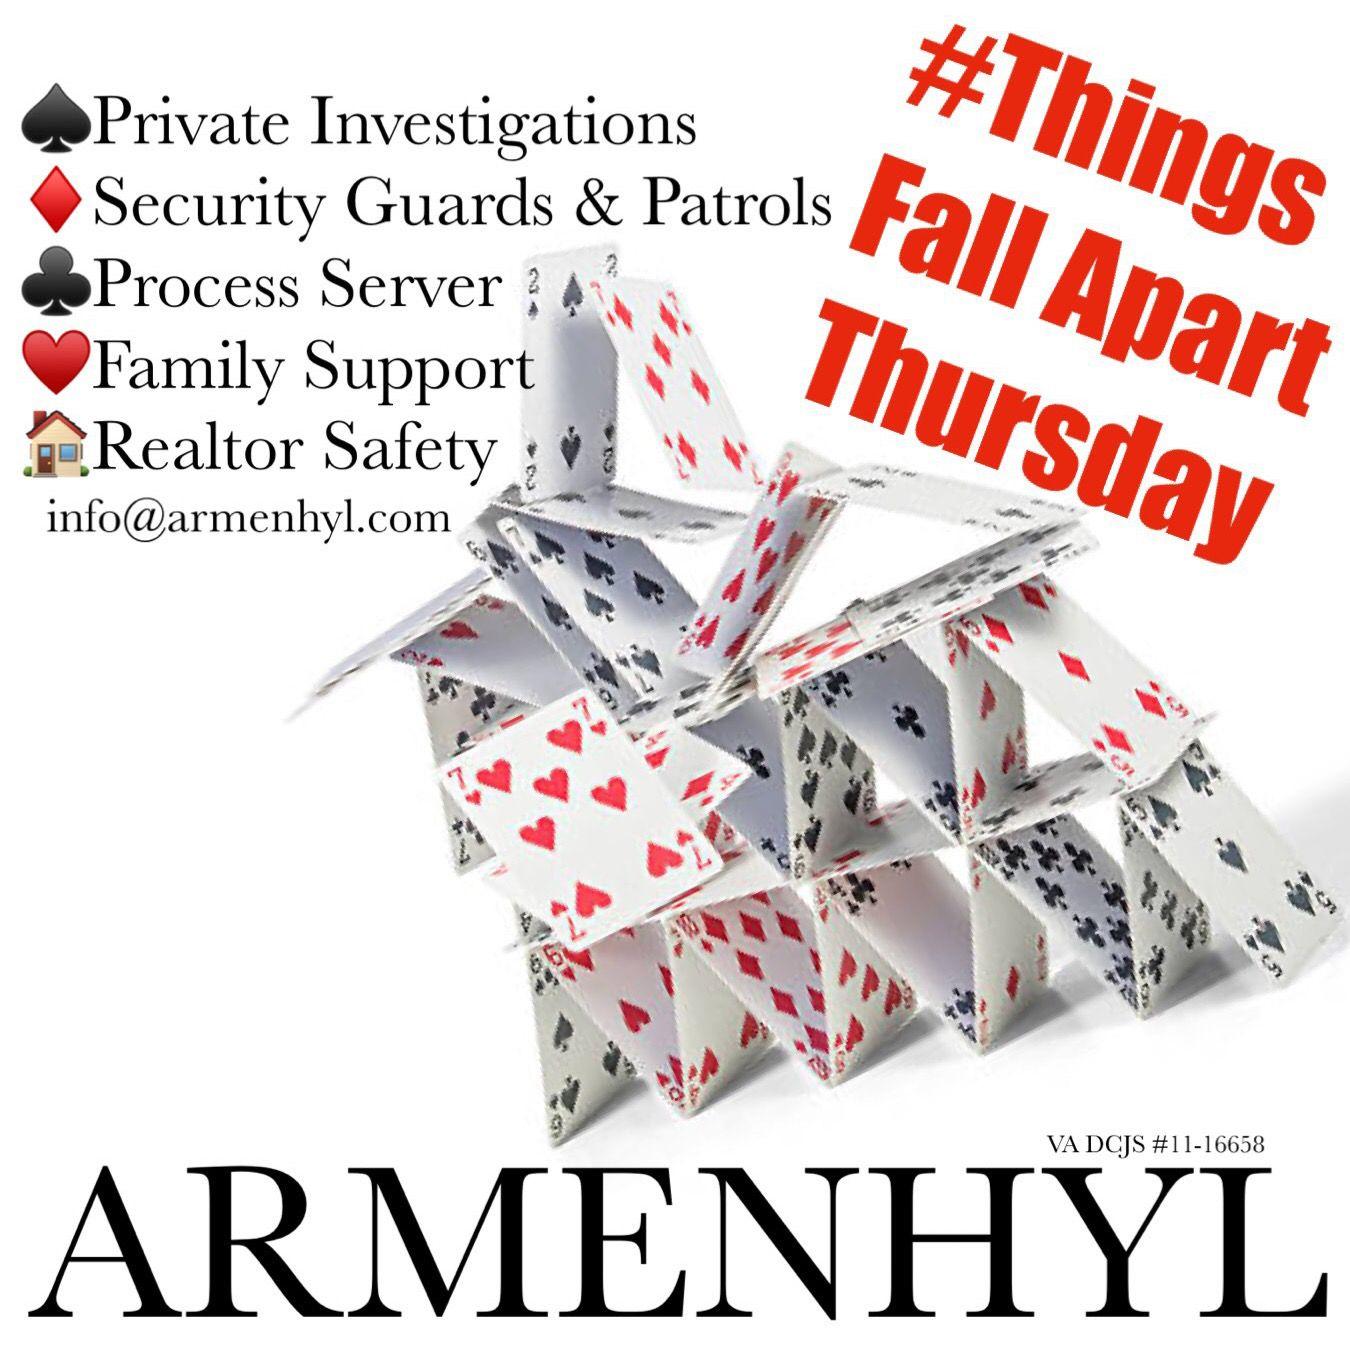 Thingsfallapartthursday Armenhyl Privateinvestigator